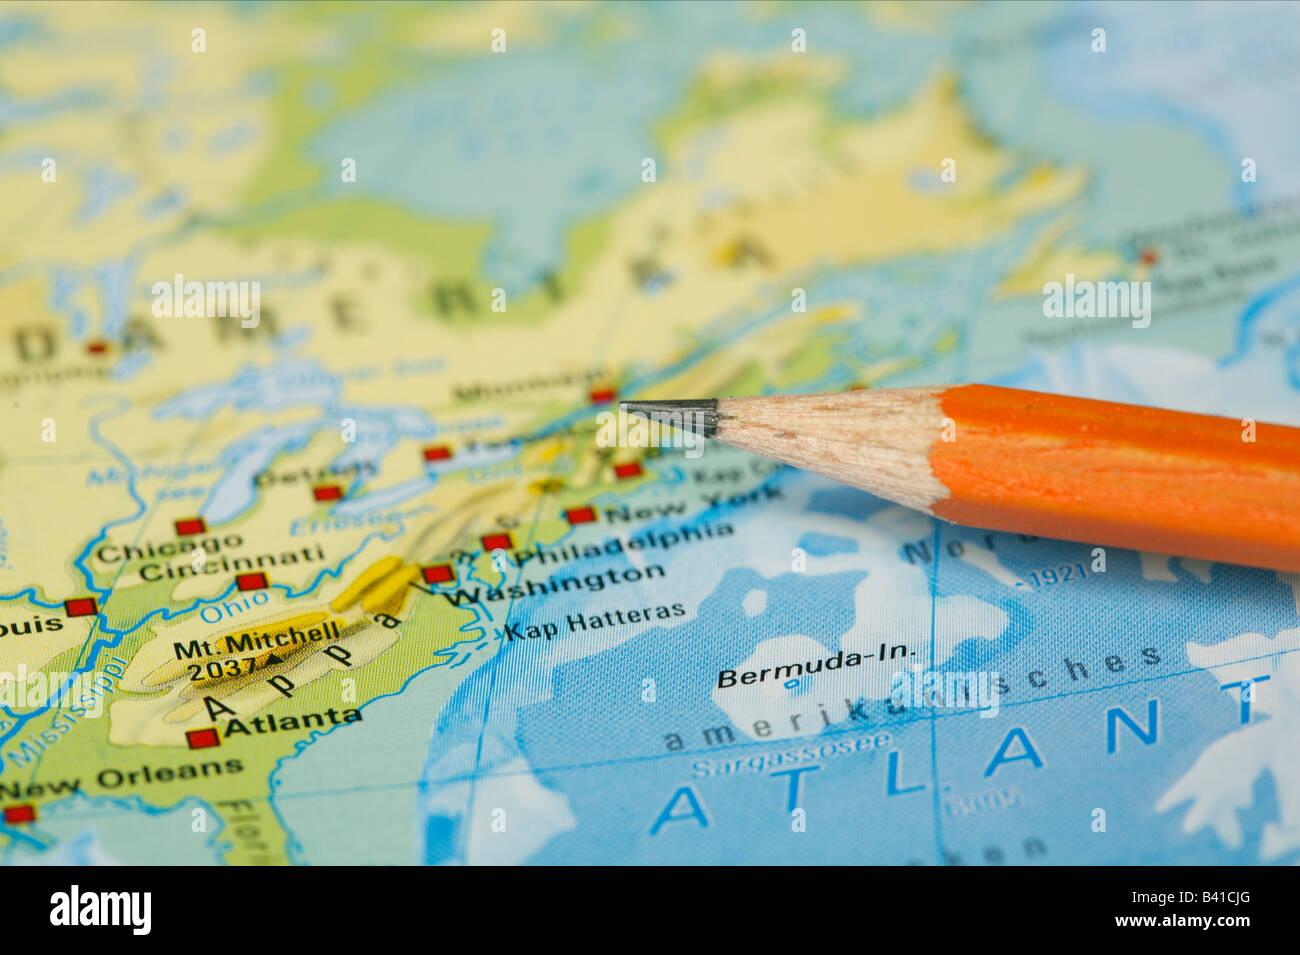 East Coast Usa Map Stock Photos & East Coast Usa Map Stock Images ...